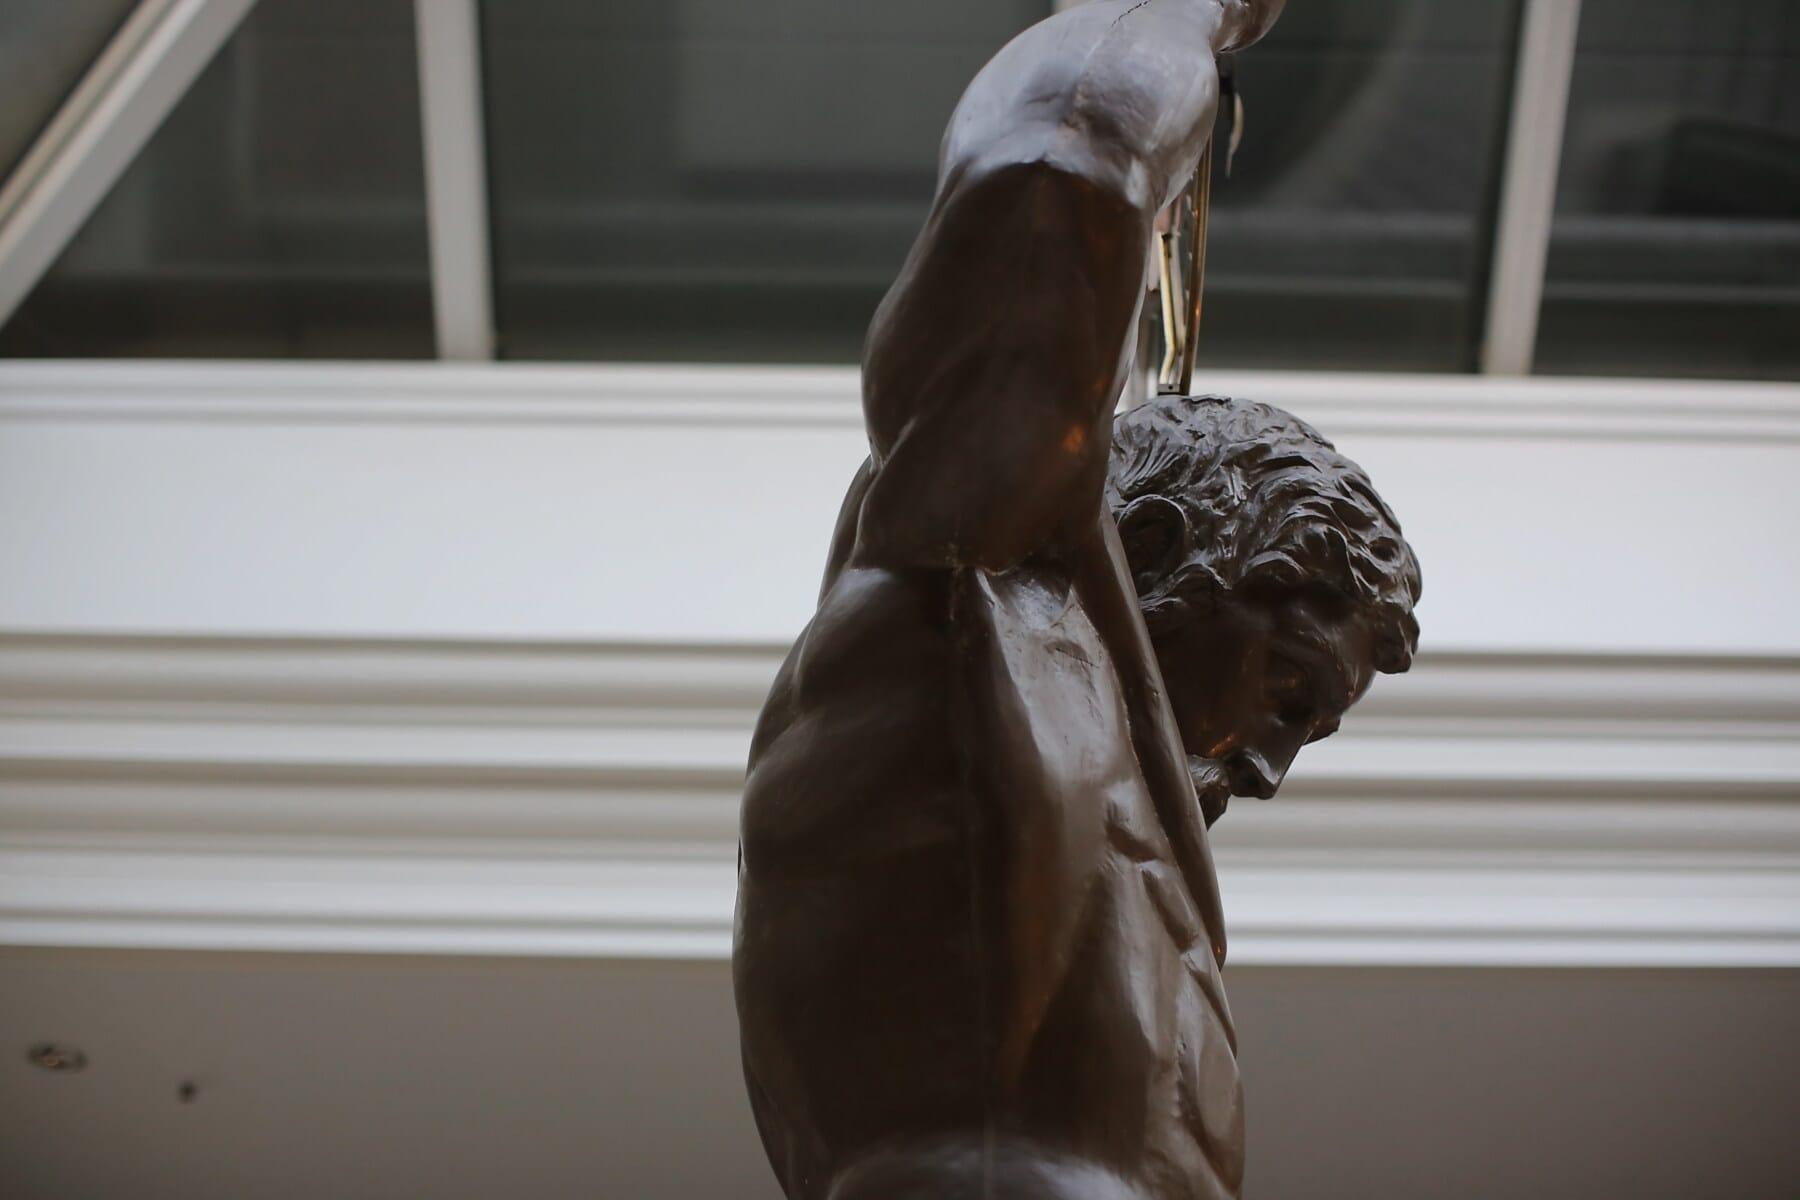 man, muscular, sculpture, atrium, bronze, art, side view, statue, portrait, indoors